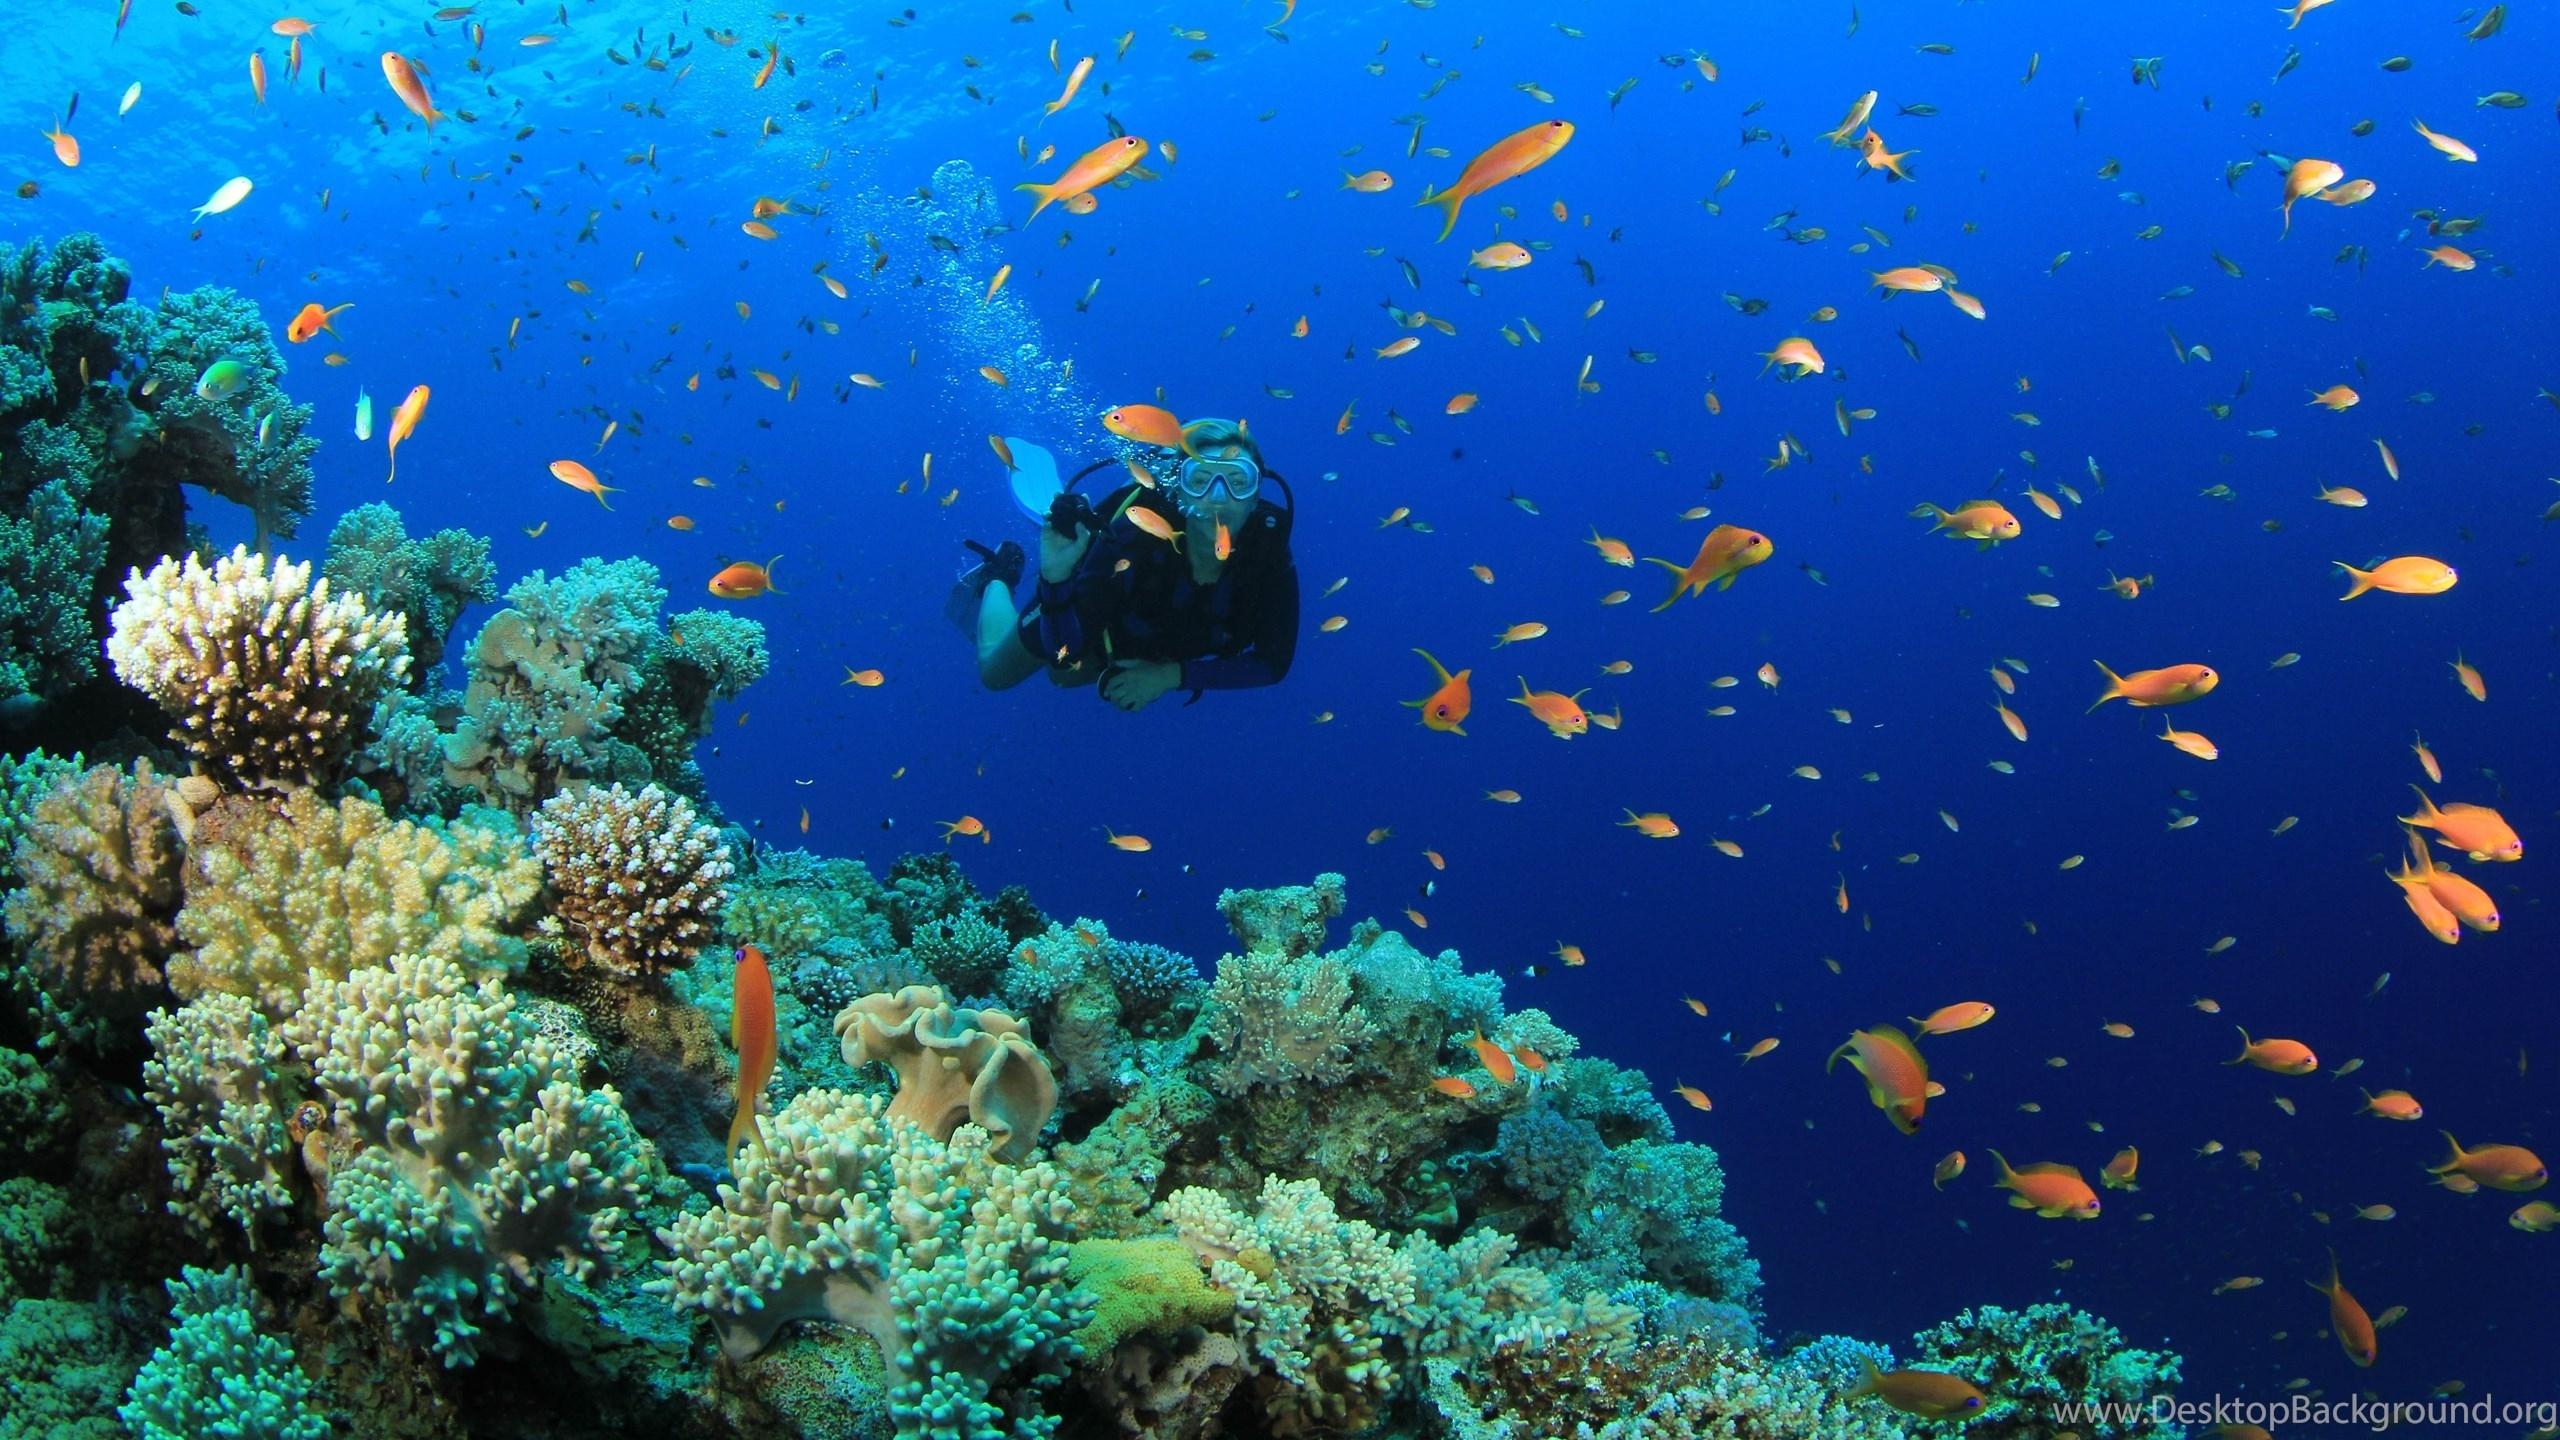 Title Scuba Diving Diver Ocean Sea Underwater Fish Wallpapers 5184x2904 Dimension 2560 X 1440 File Type JPG JPEG